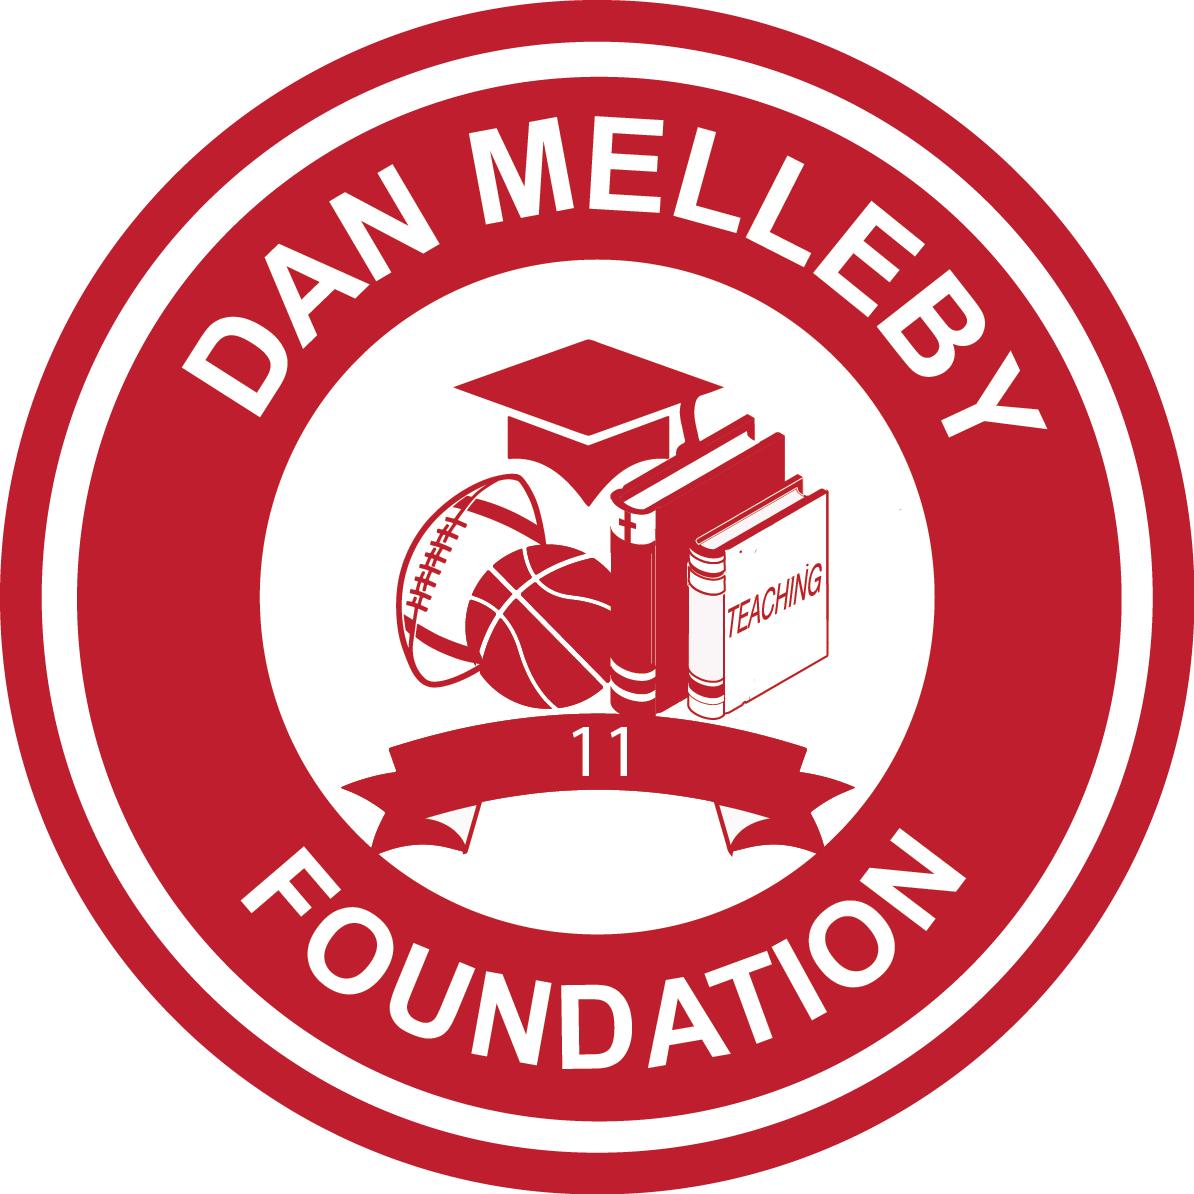 The Dan Melleby Foundation